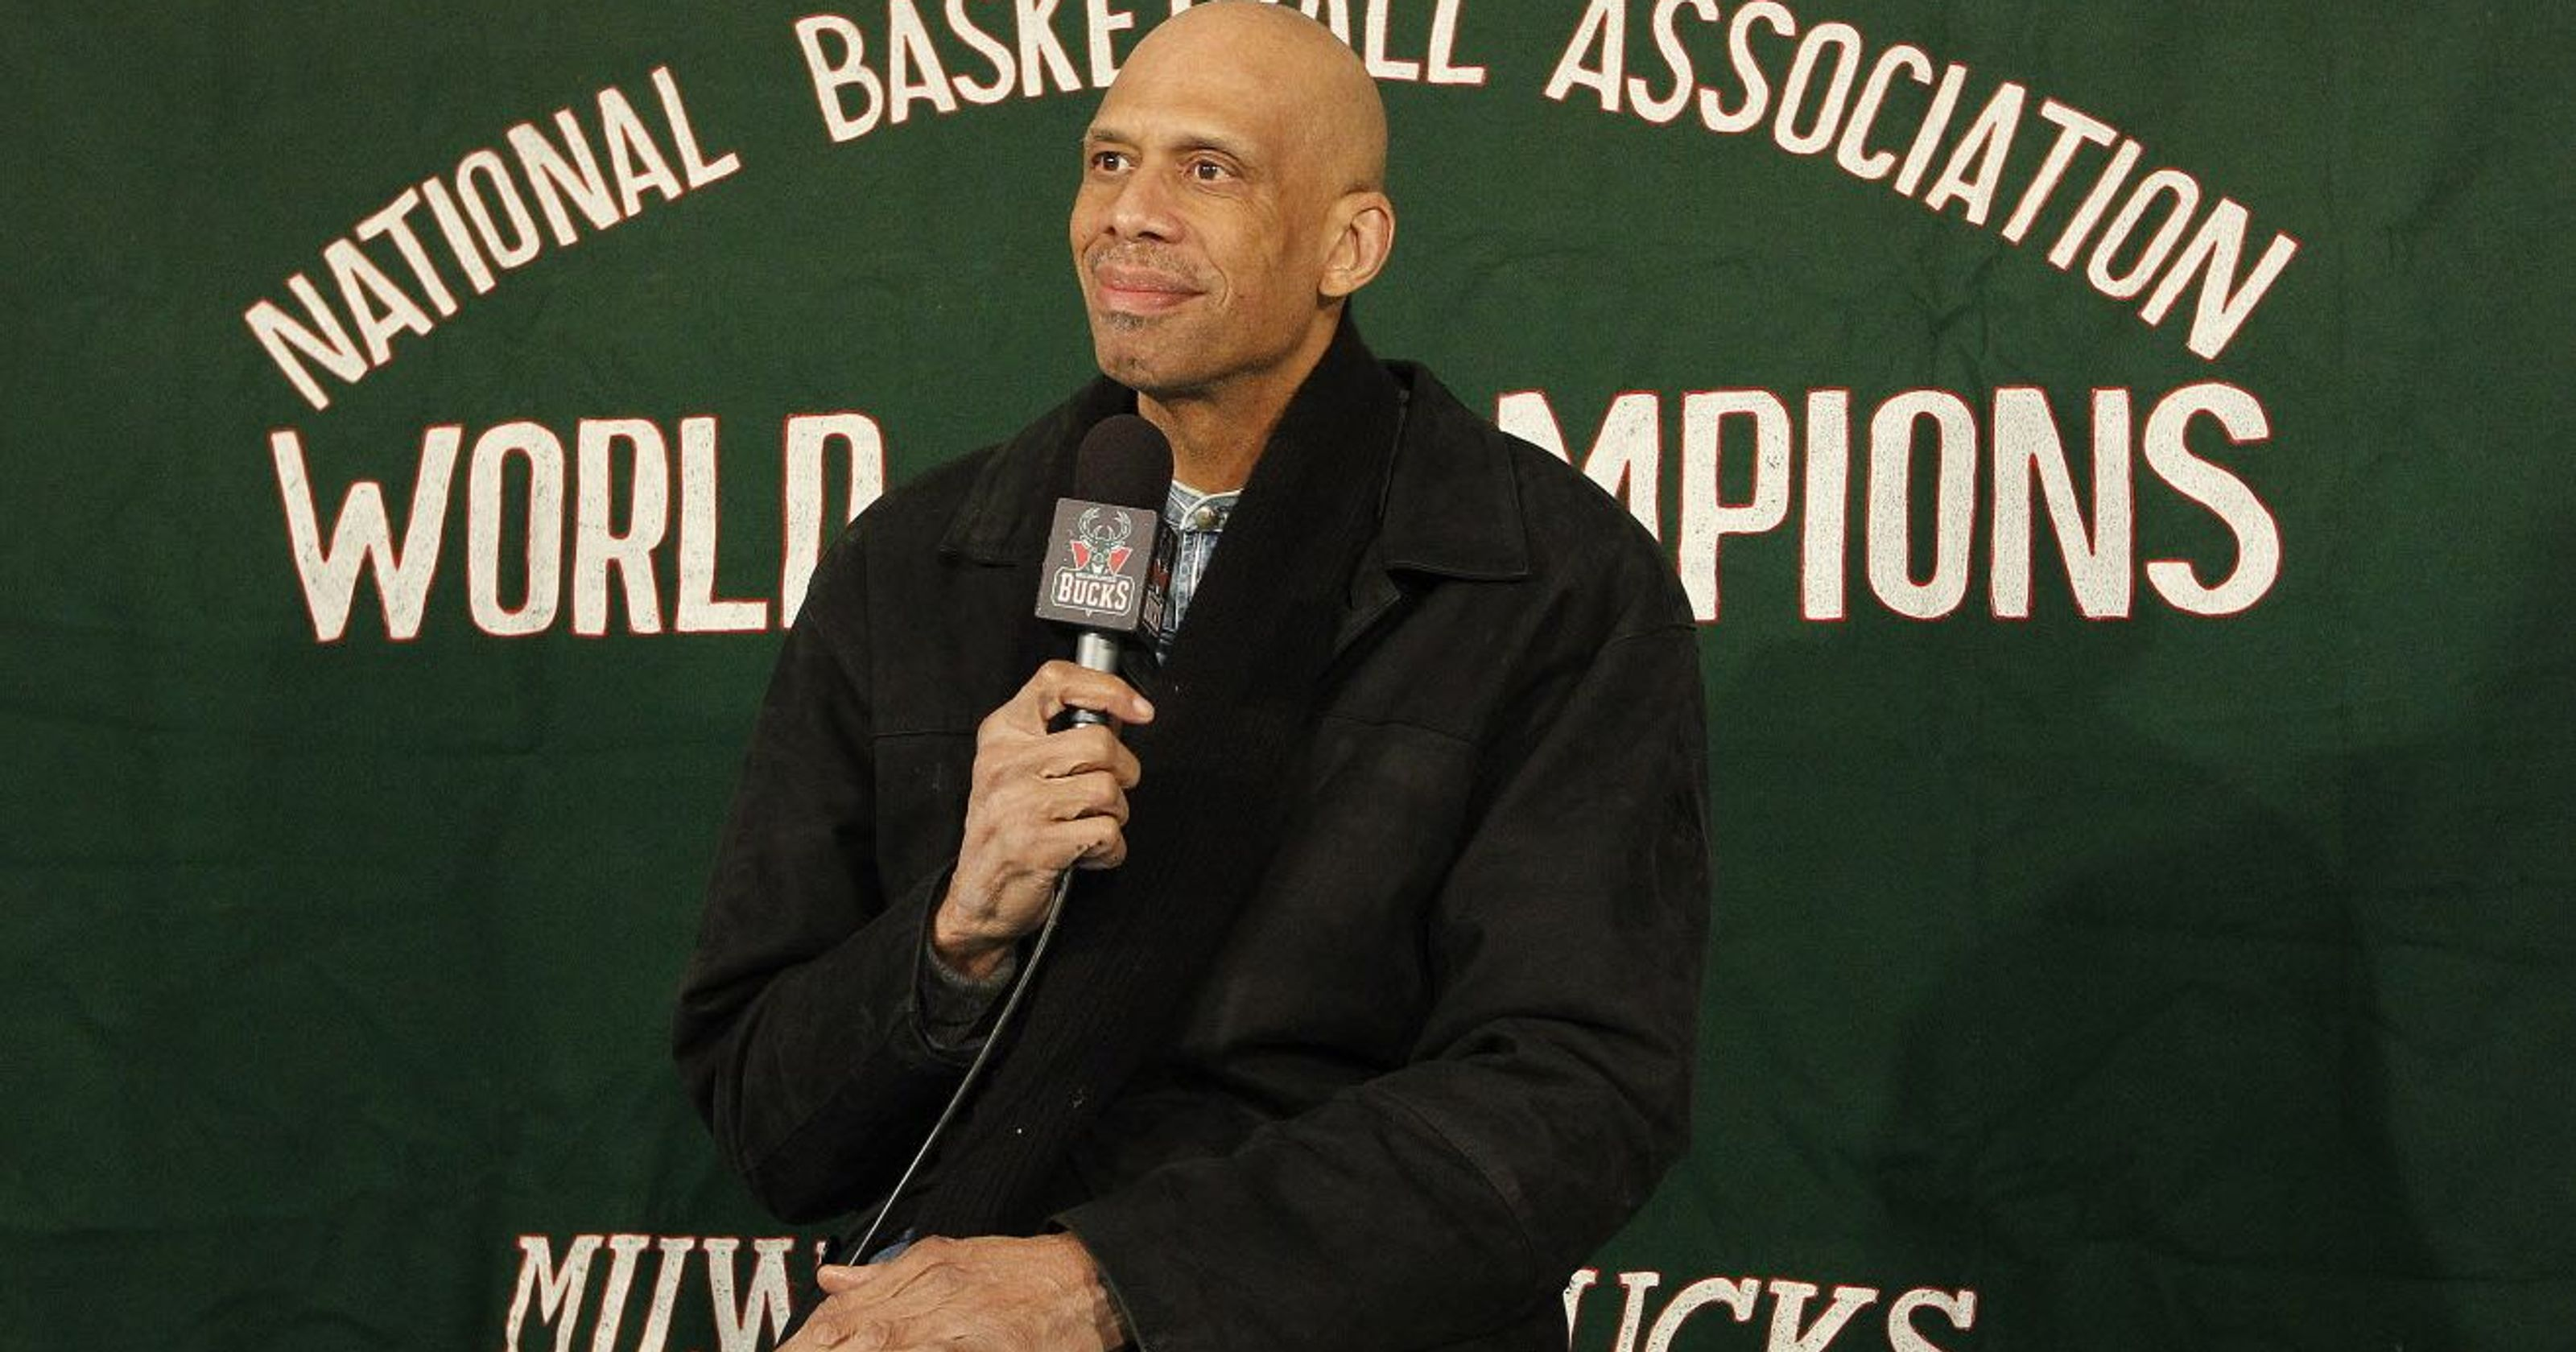 Kareem Abdul-Jabbar, a retired National Basketball Association Hall of Fame player, has long spoken out on social issues. (Milwaukee Journal Sentinel)